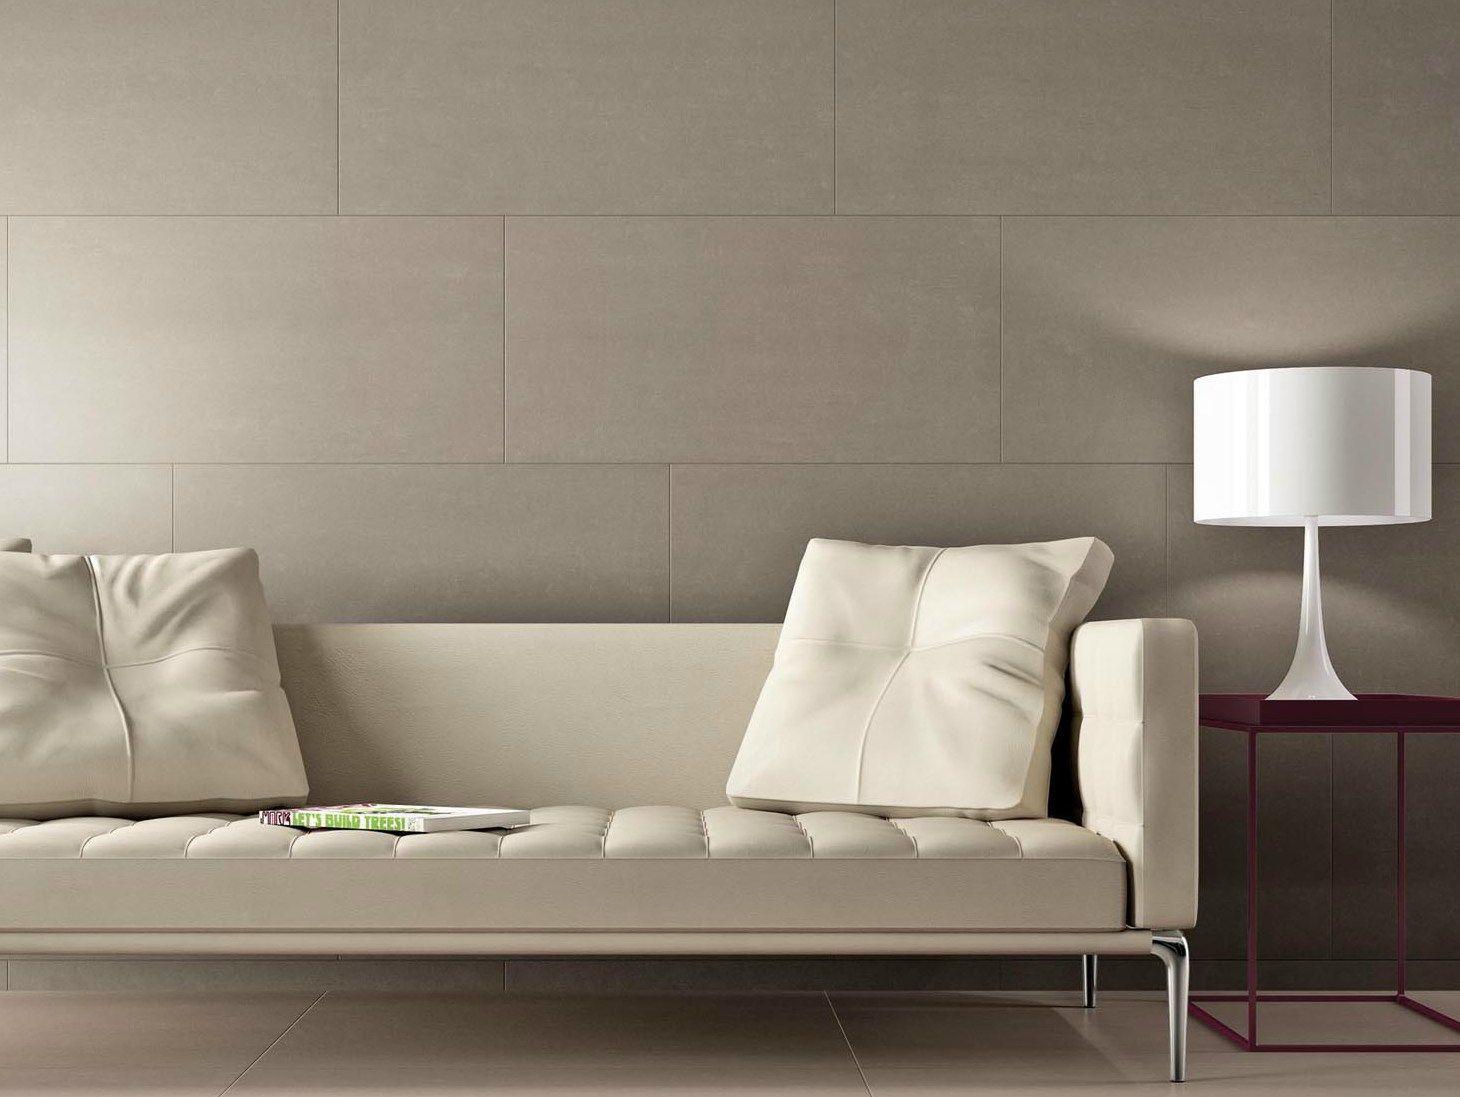 Indooroutdoor wallfloor tiles sistem n by marazzi sit and indooroutdoor wallfloor tiles sistem n by marazzi dailygadgetfo Images